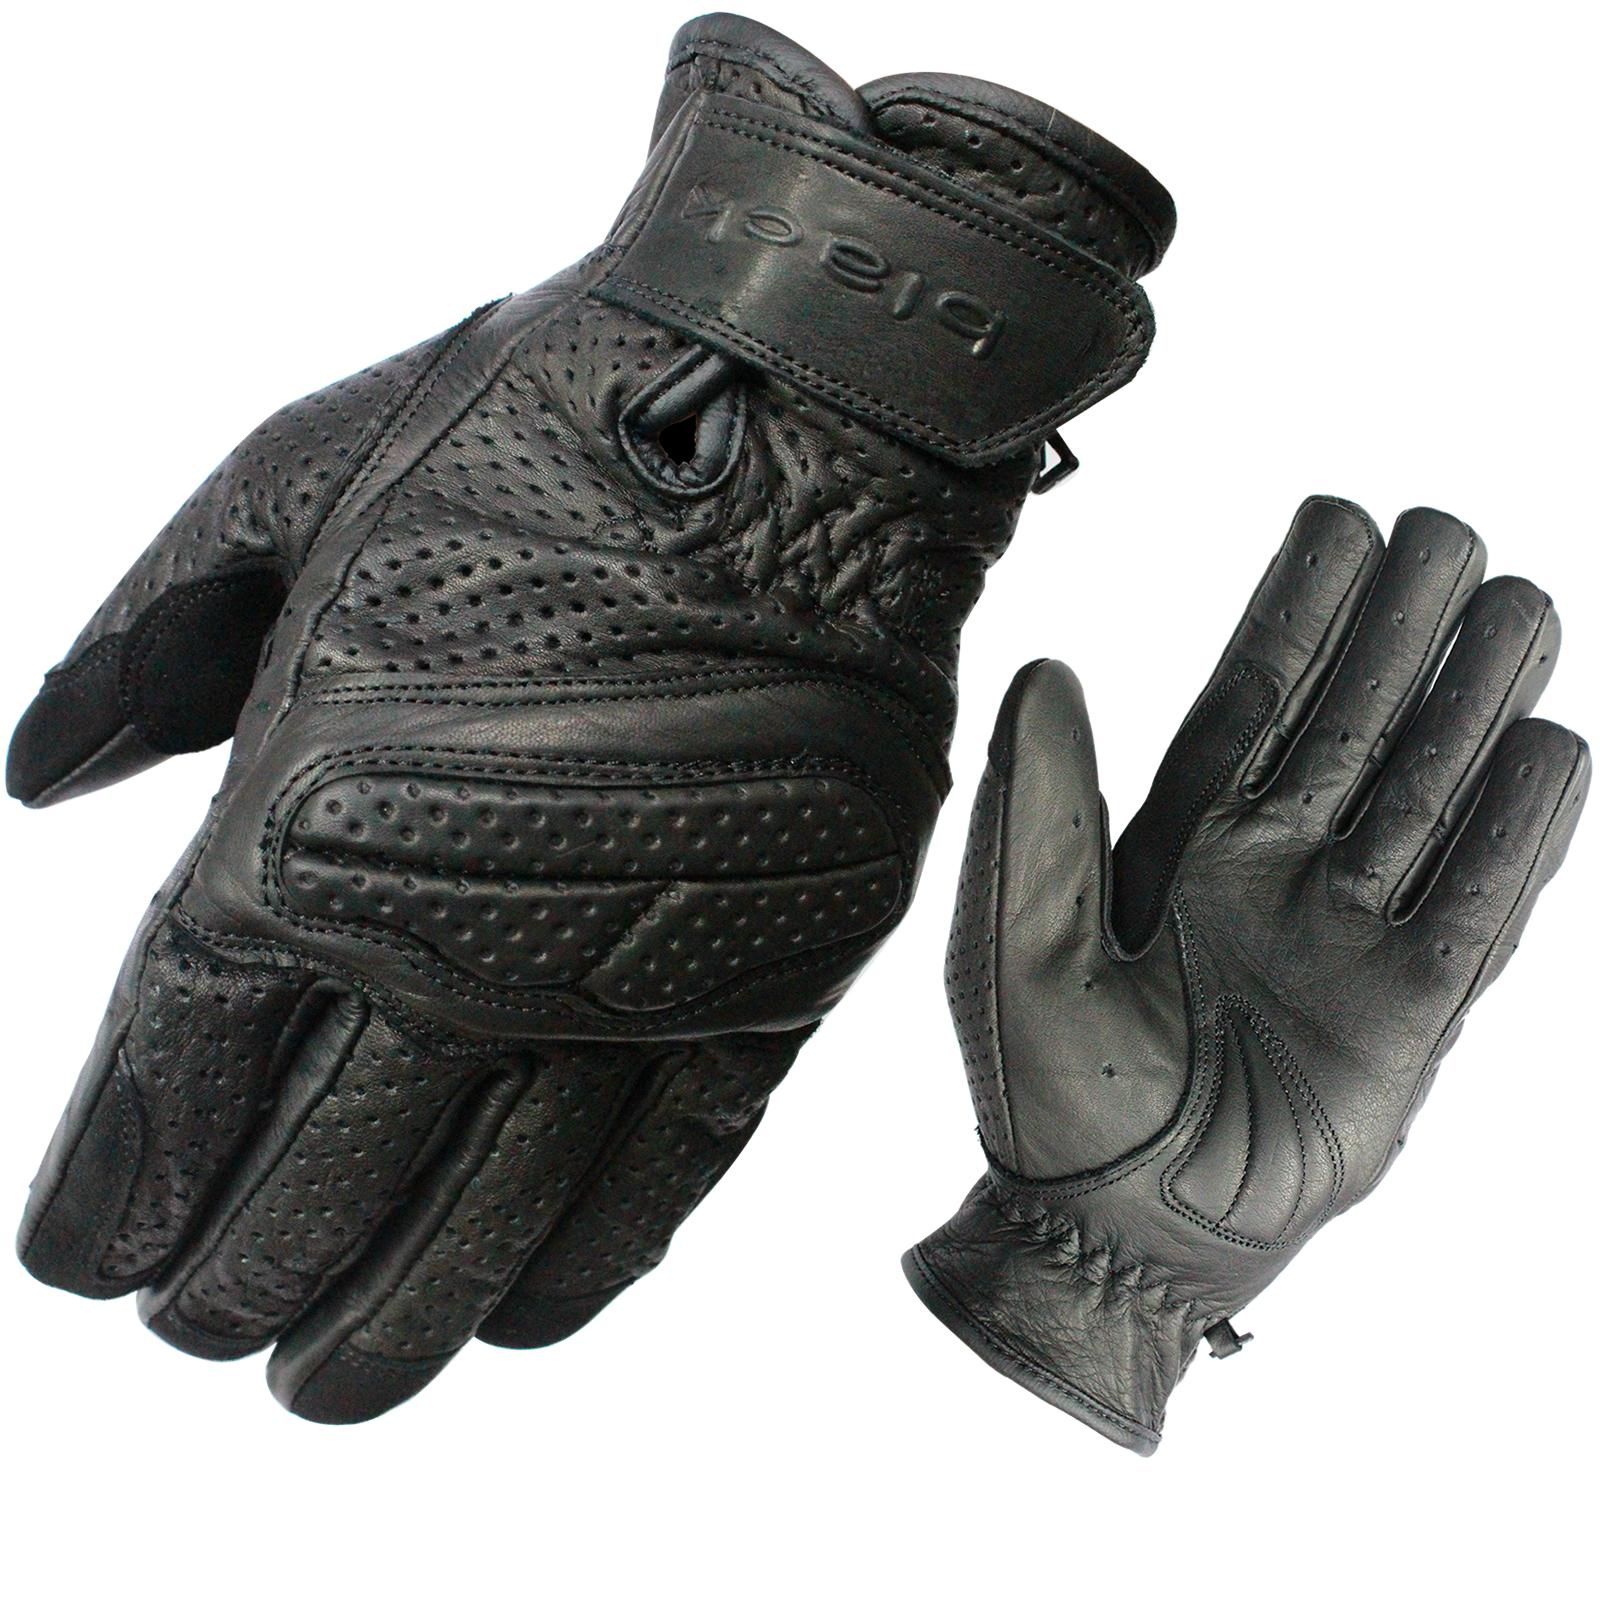 Motorcycle gloves for summer - Black Active Leather Short Motorbike Gloves Motorcycle Bike Vented Summer Glove